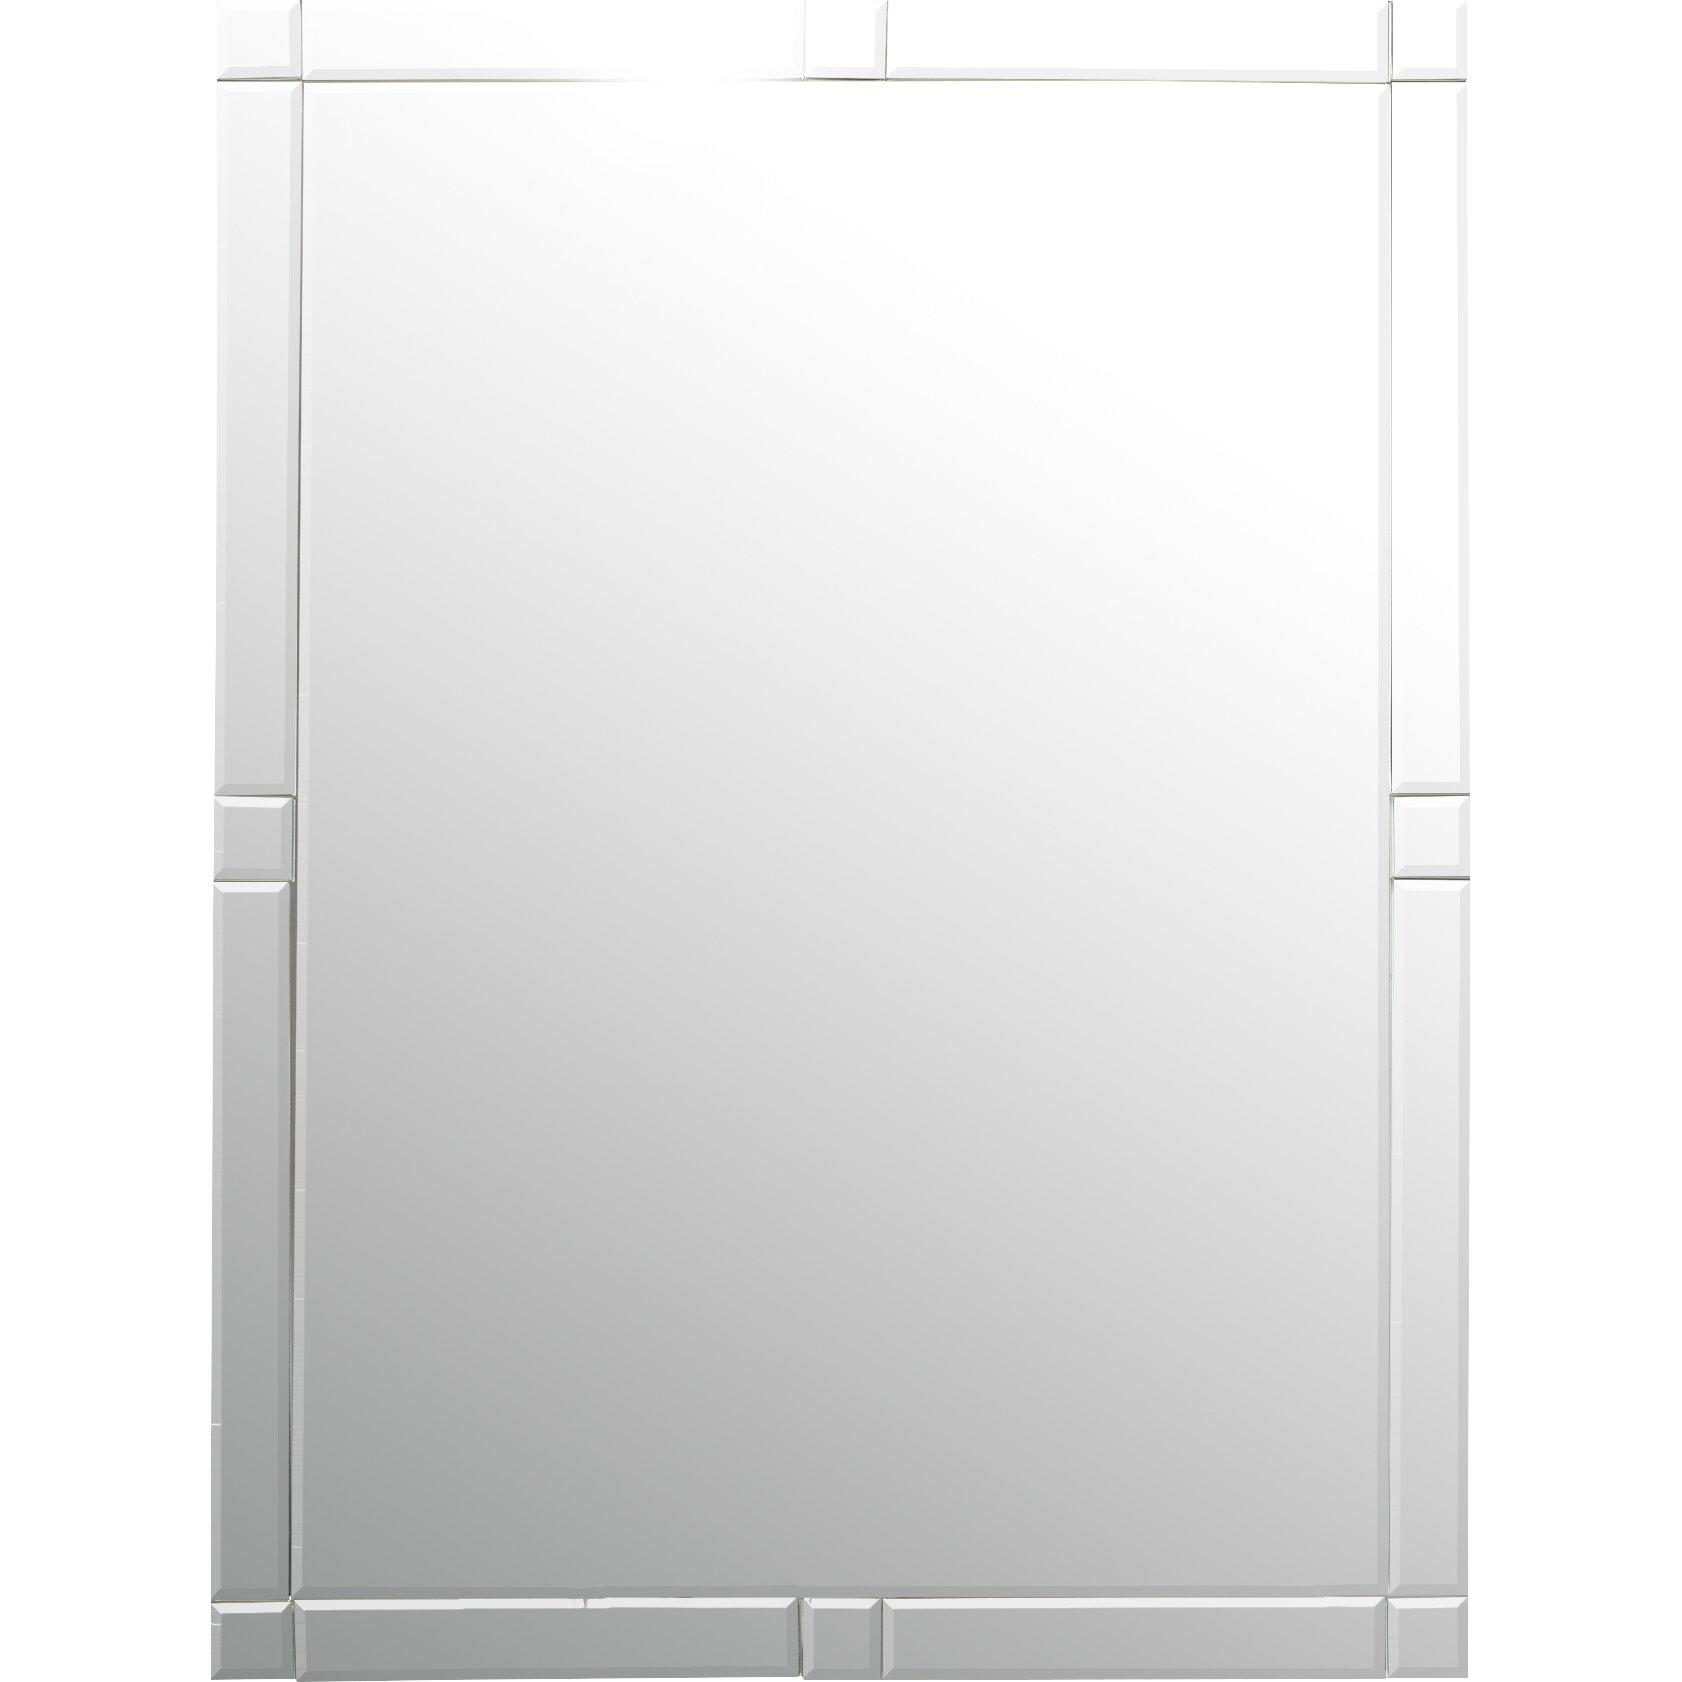 Wade Logan Frameless Wall Mirror Reviews Wayfair For Frameless Wall Mirror (Image 8 of 15)